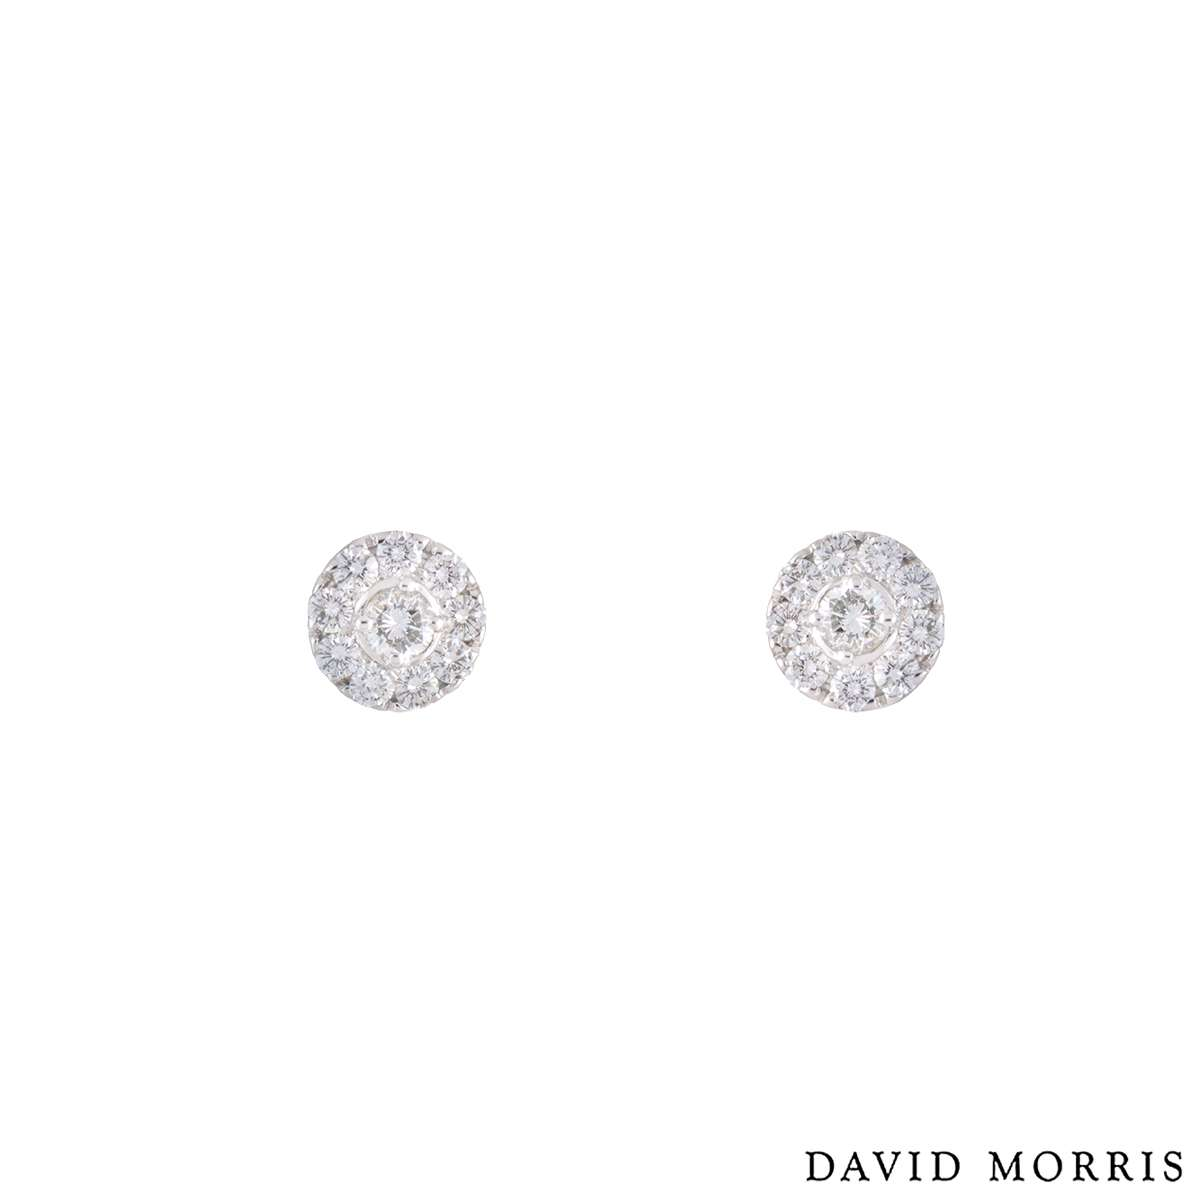 568e7c1f48d452 David Morris 18k White Gold Diamond Cluster Earrings 1.14ct - Rich Diamonds  Of Bond Street